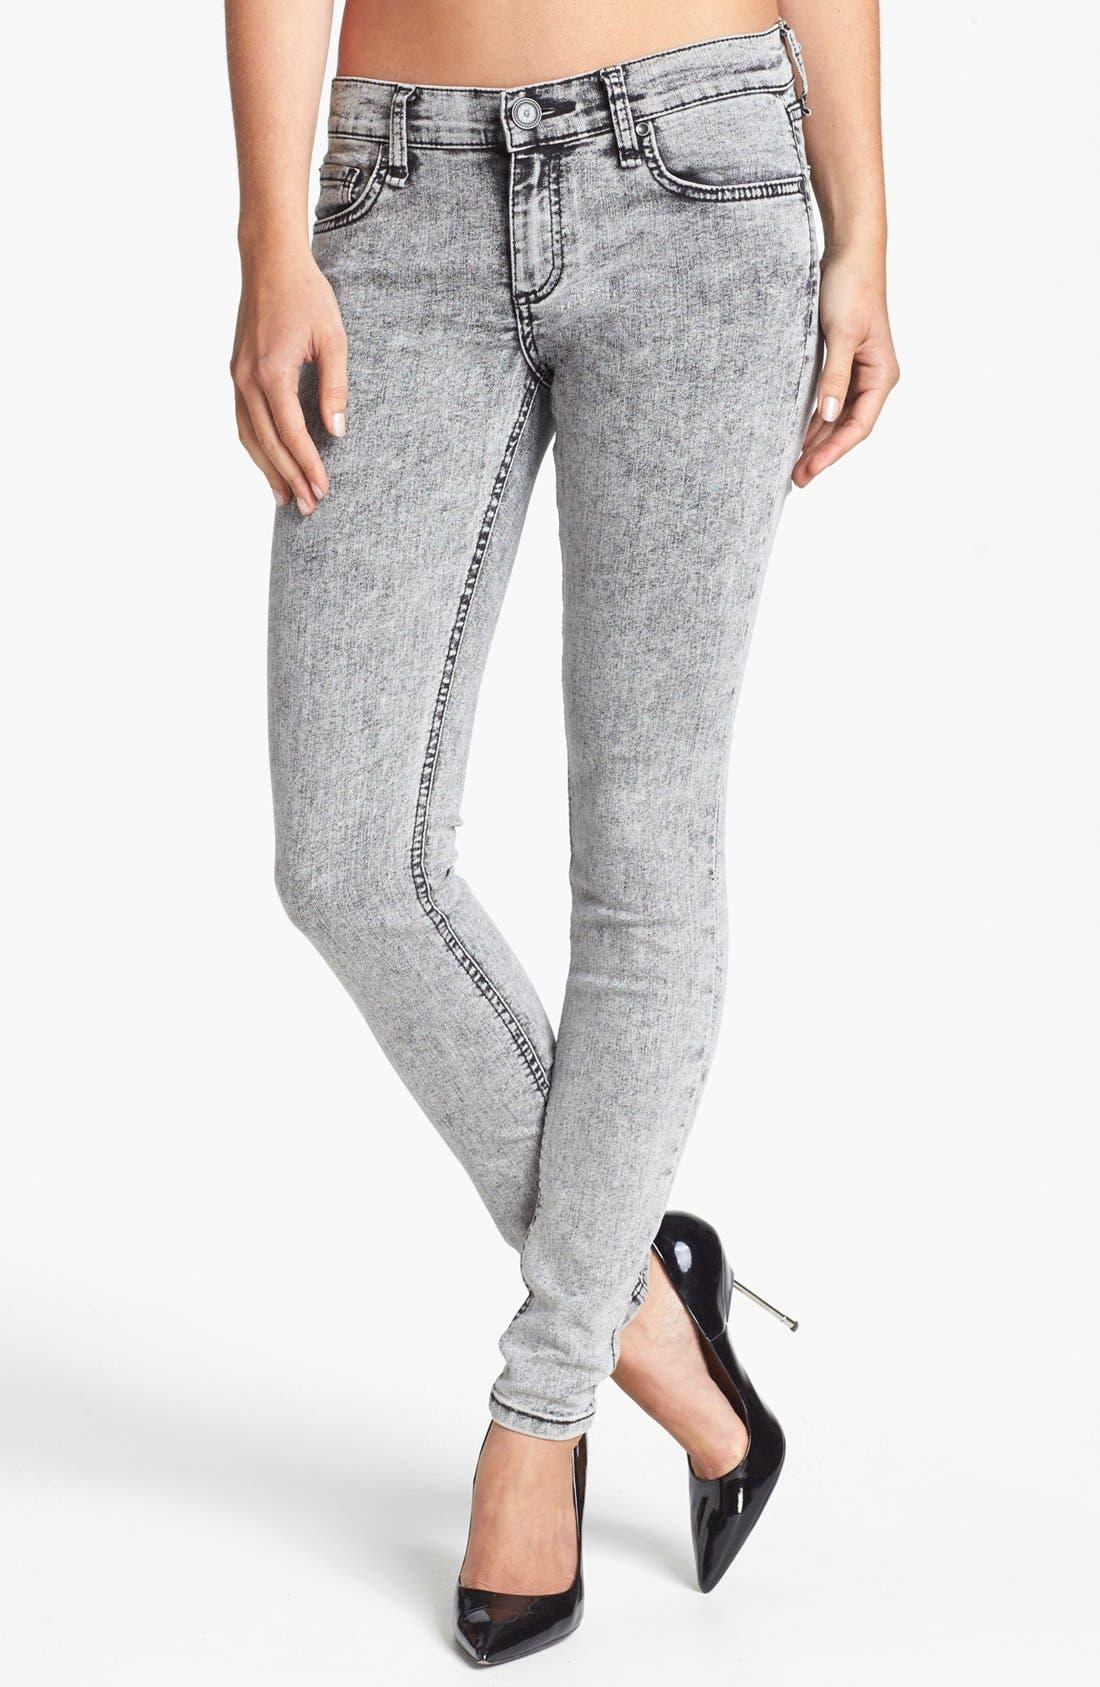 Main Image - edyson 'Sloan' Acid Wash Skinny Jeans (Grey Maven)